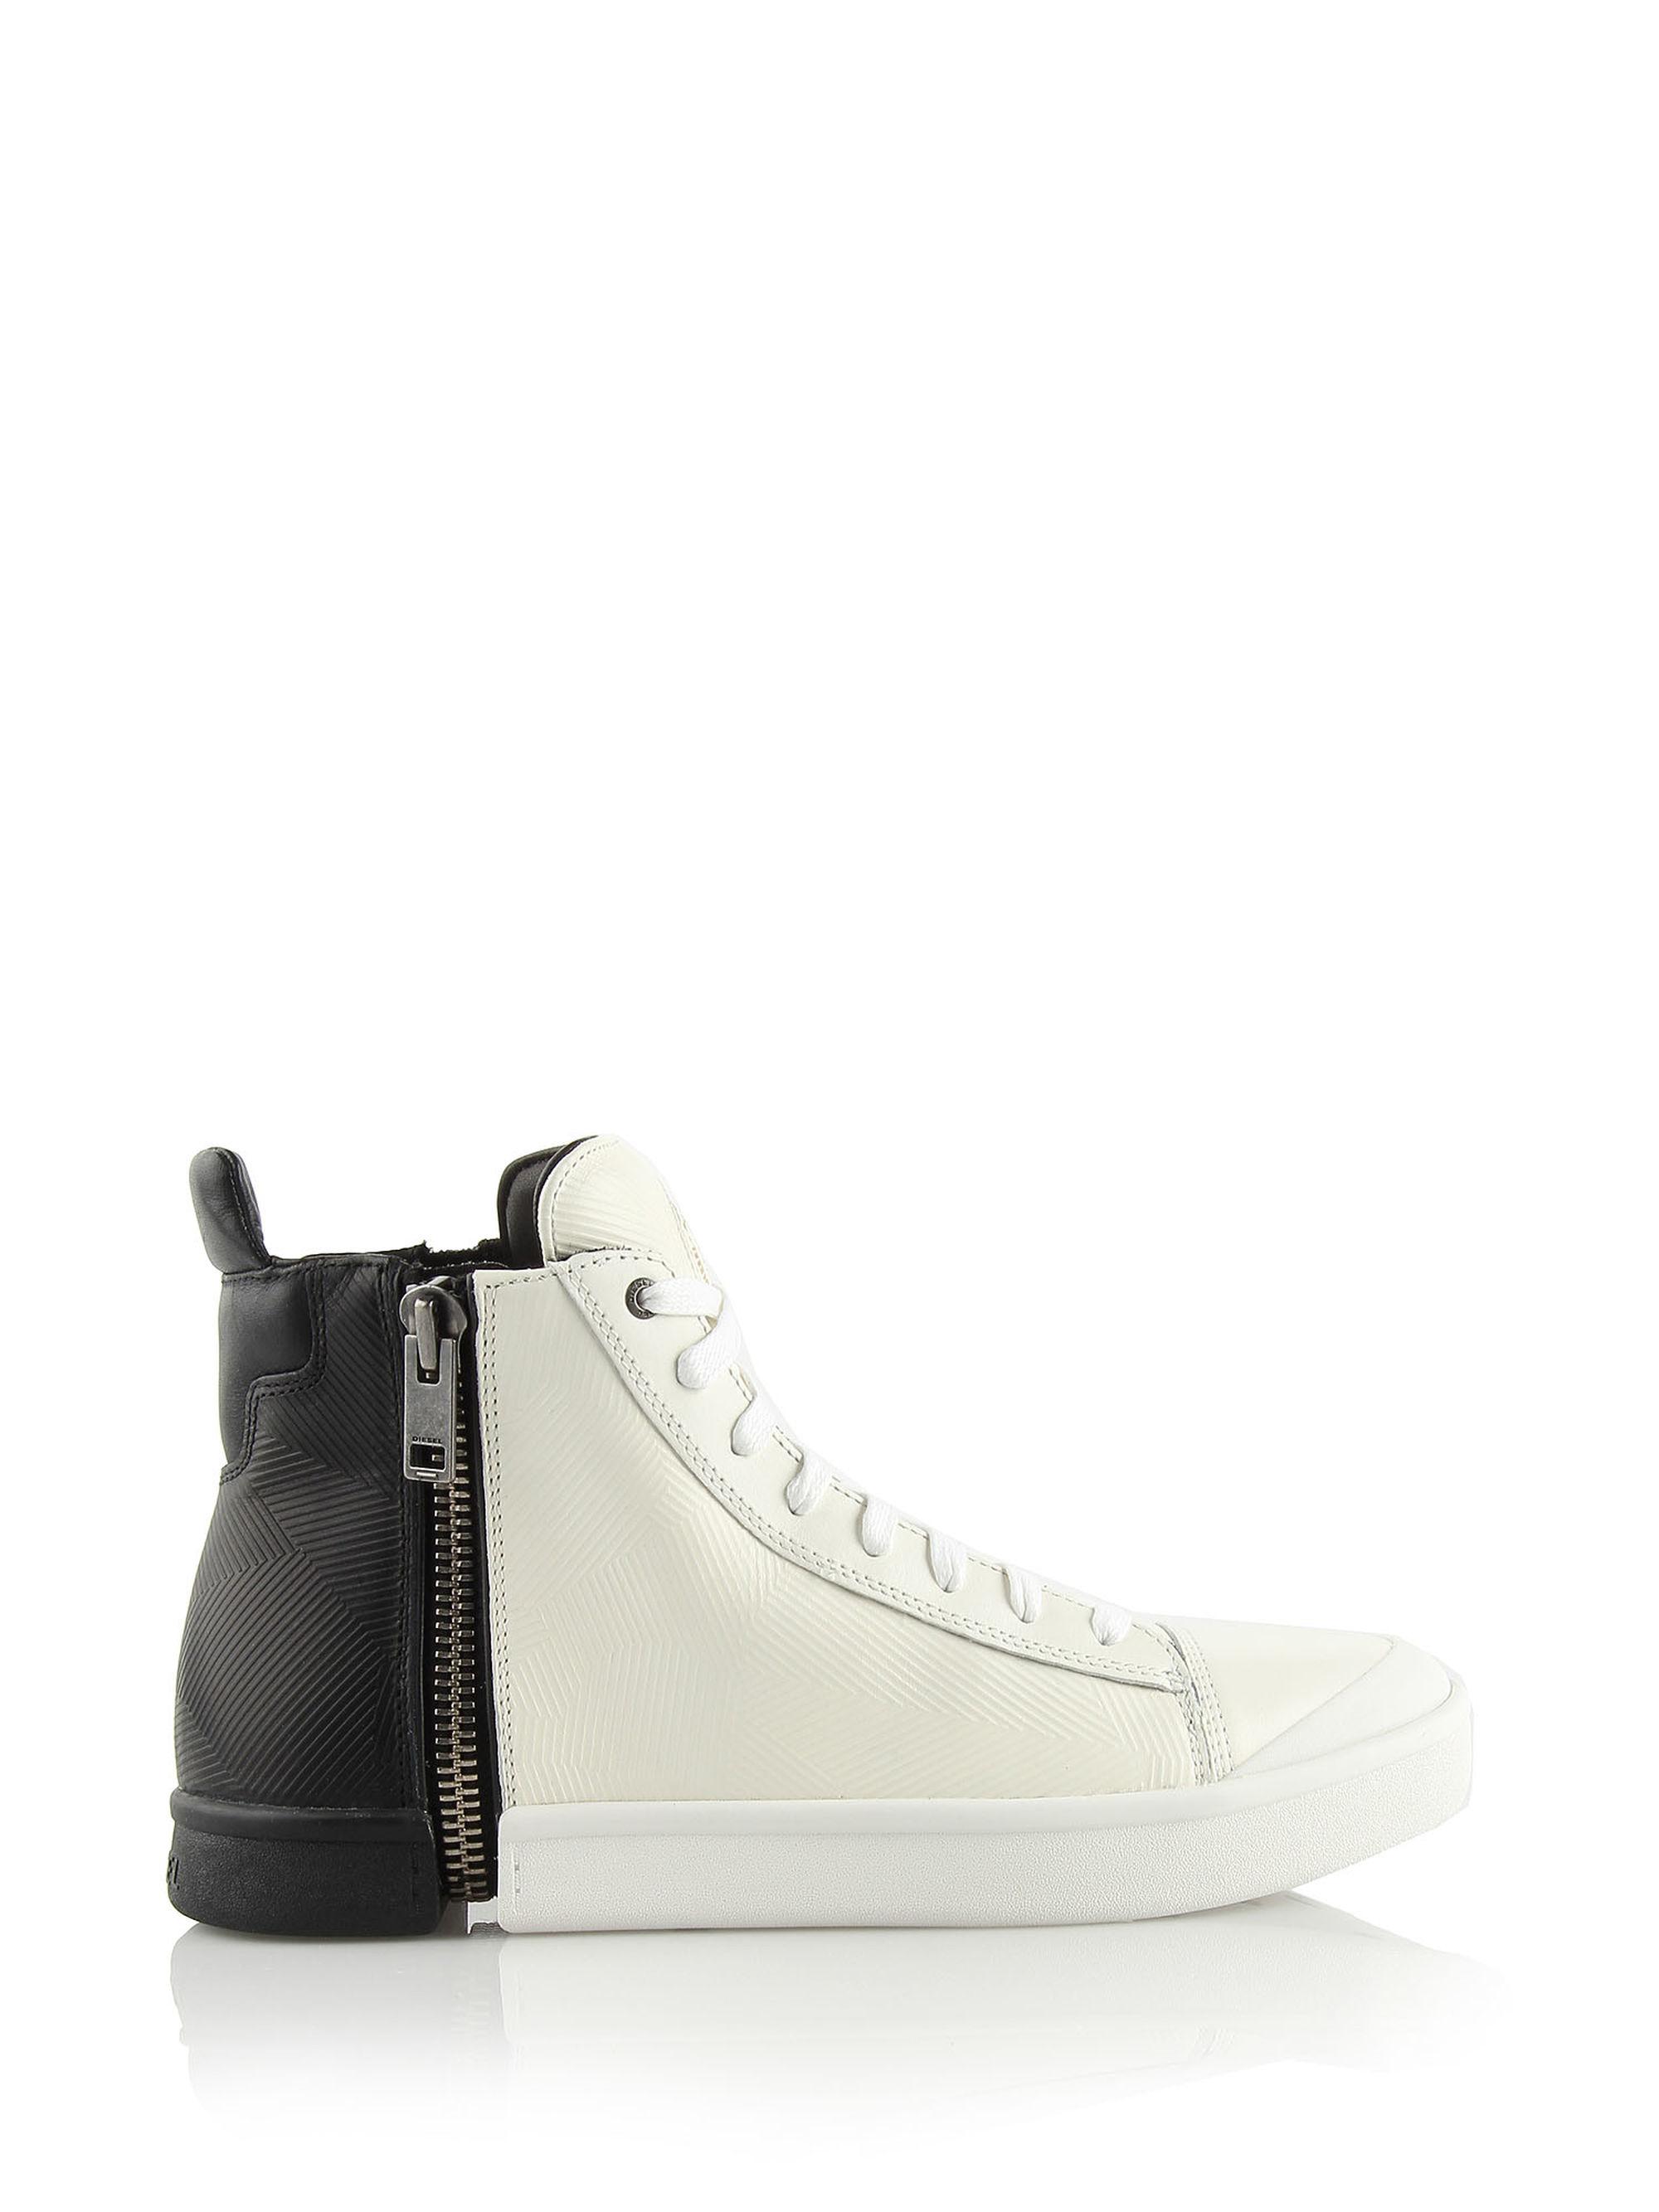 S-NENTISH - Sneaker high - white Billig Verkauf Gut Verkaufen Modisch Online-Shopping-Outlet Verkauf keSflPRZv